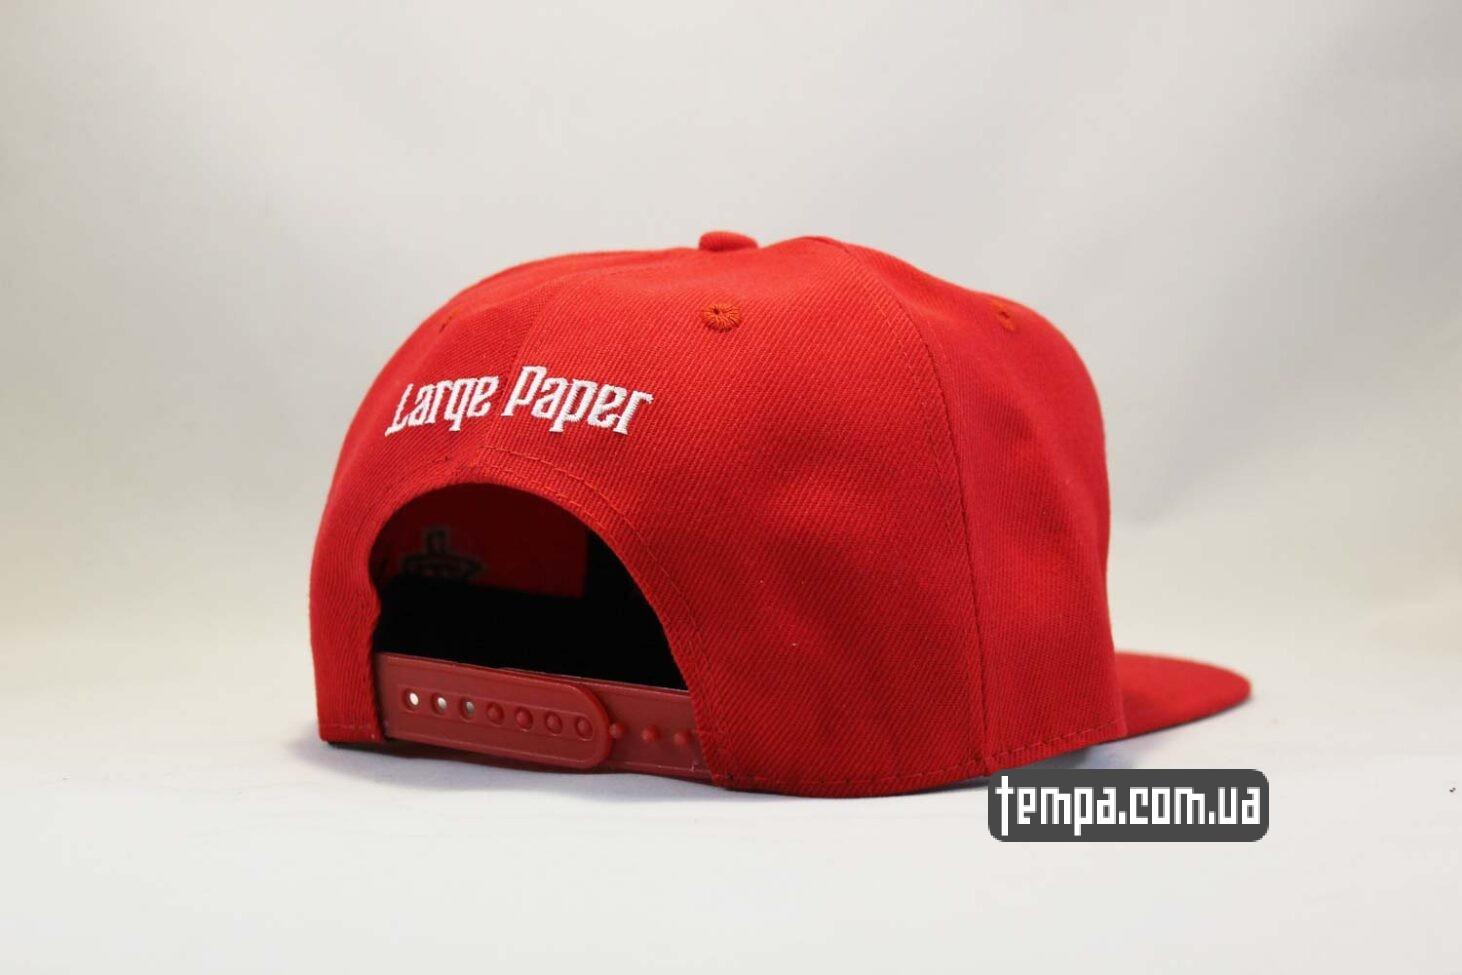 Large Paper кепка Snapback ASOS PHAT Red красная бейсболка